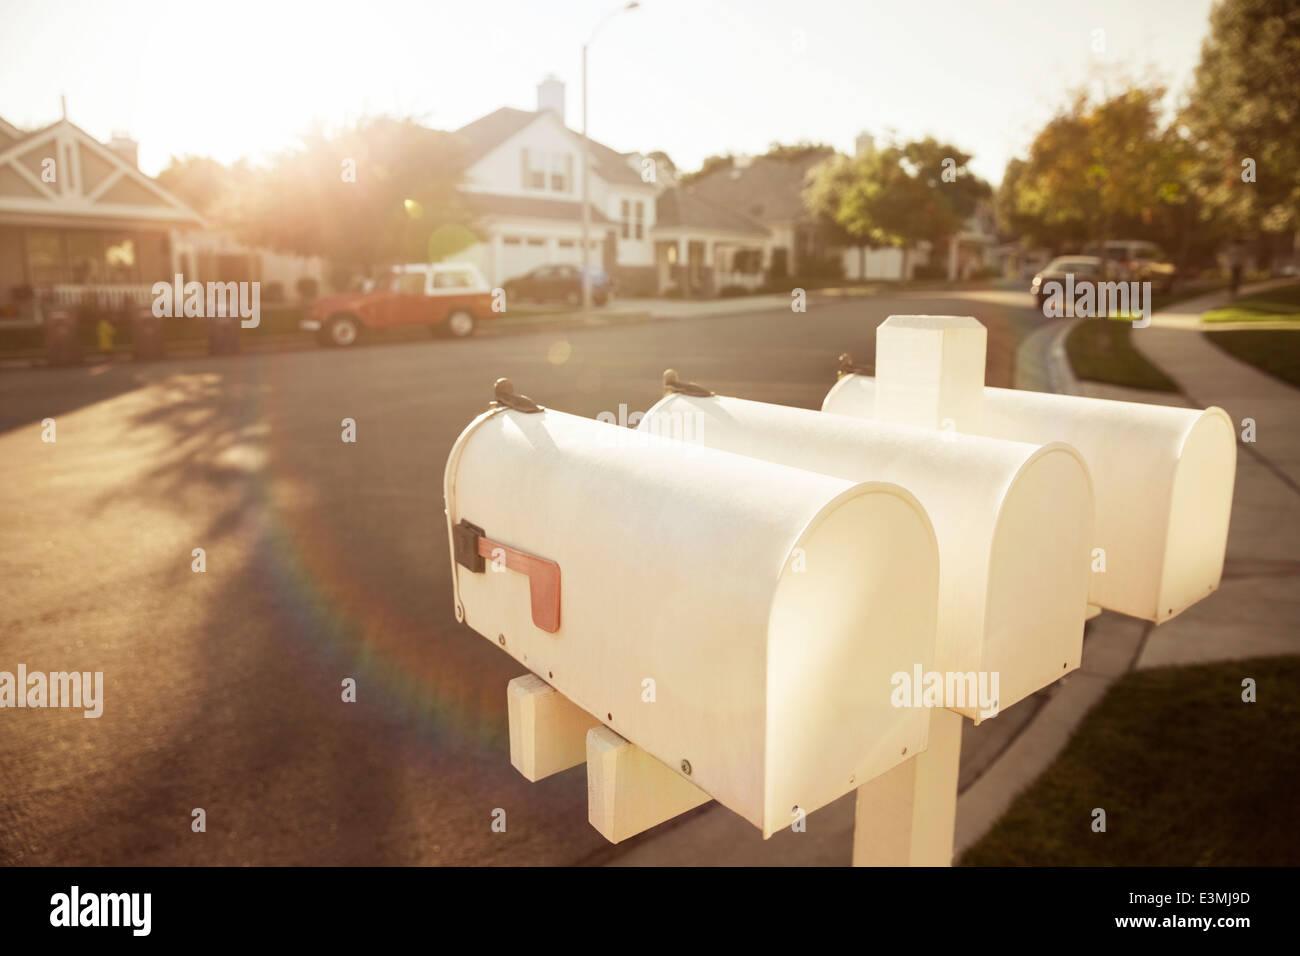 Mailboxes on suburban street - Stock Image